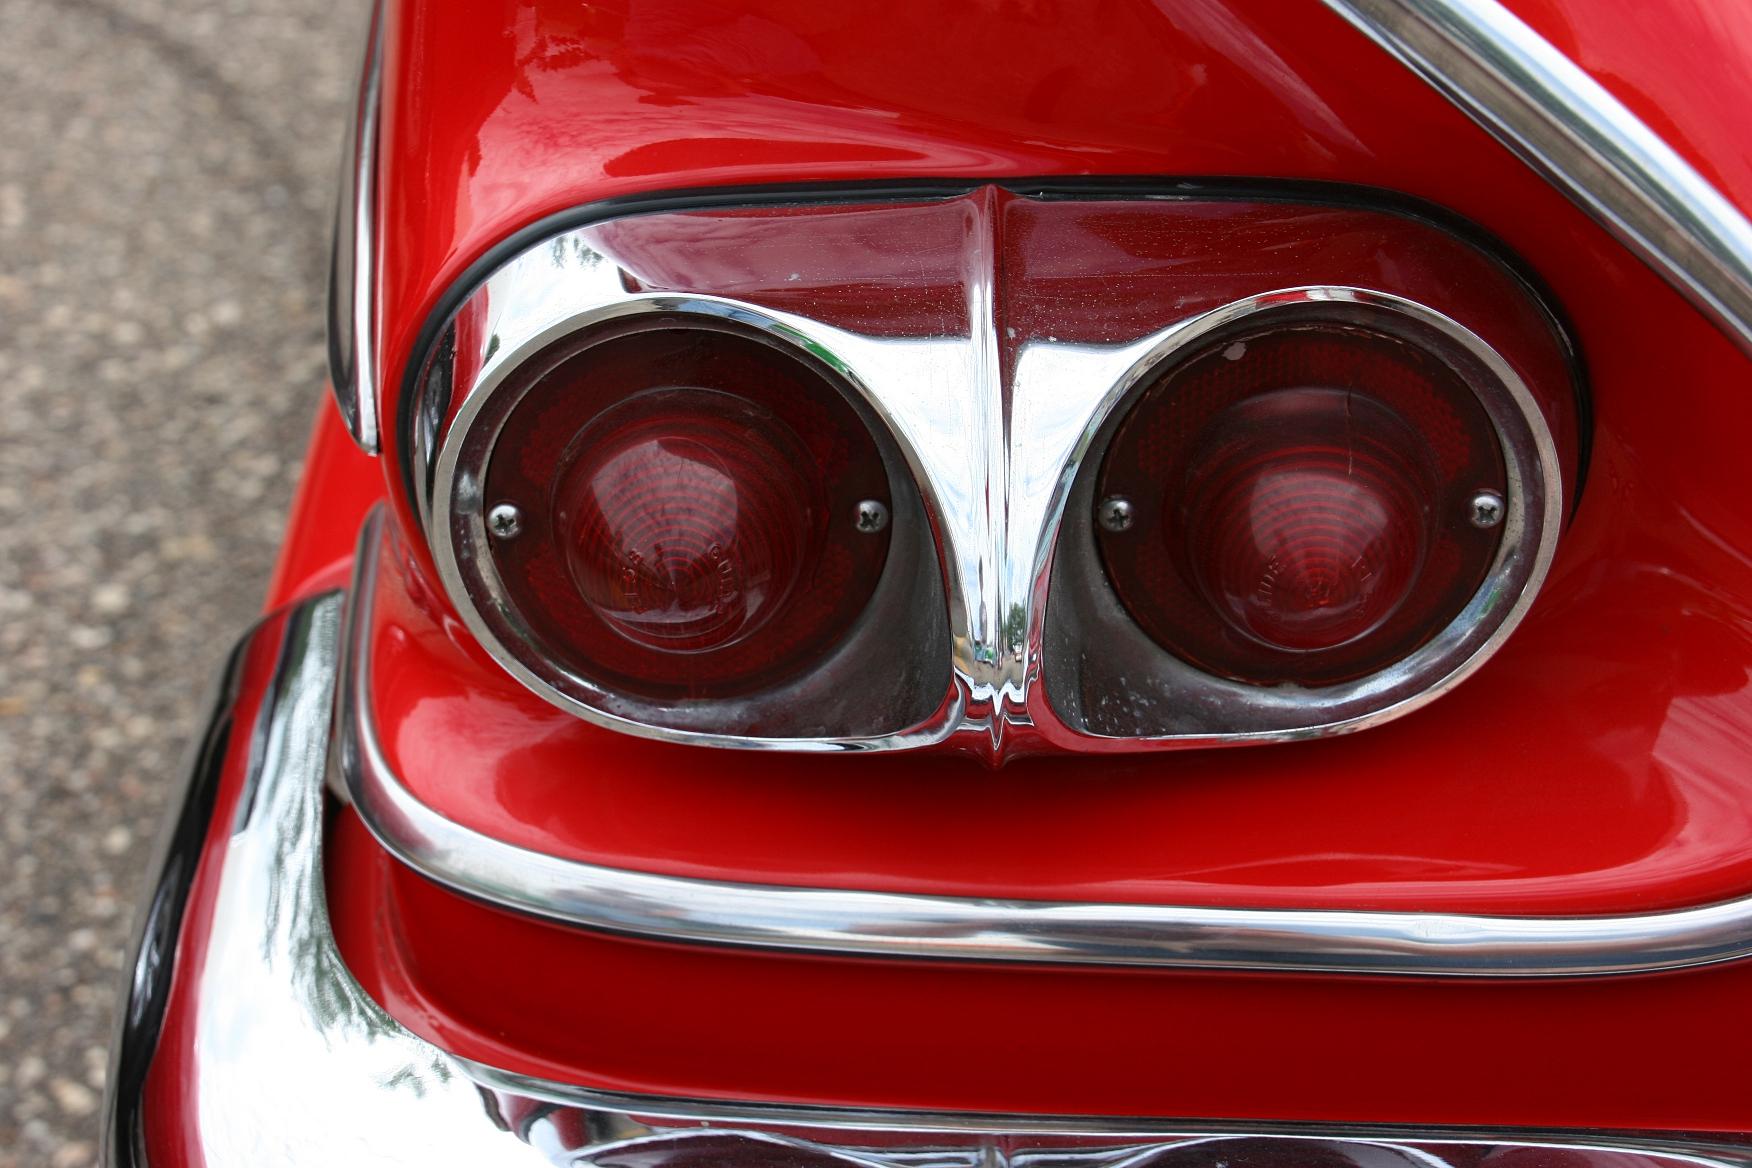 1958 Chevy Tail Light Wiring Diagram Cars Minnesota Prairie Roots 1961 Chevrolet Lights